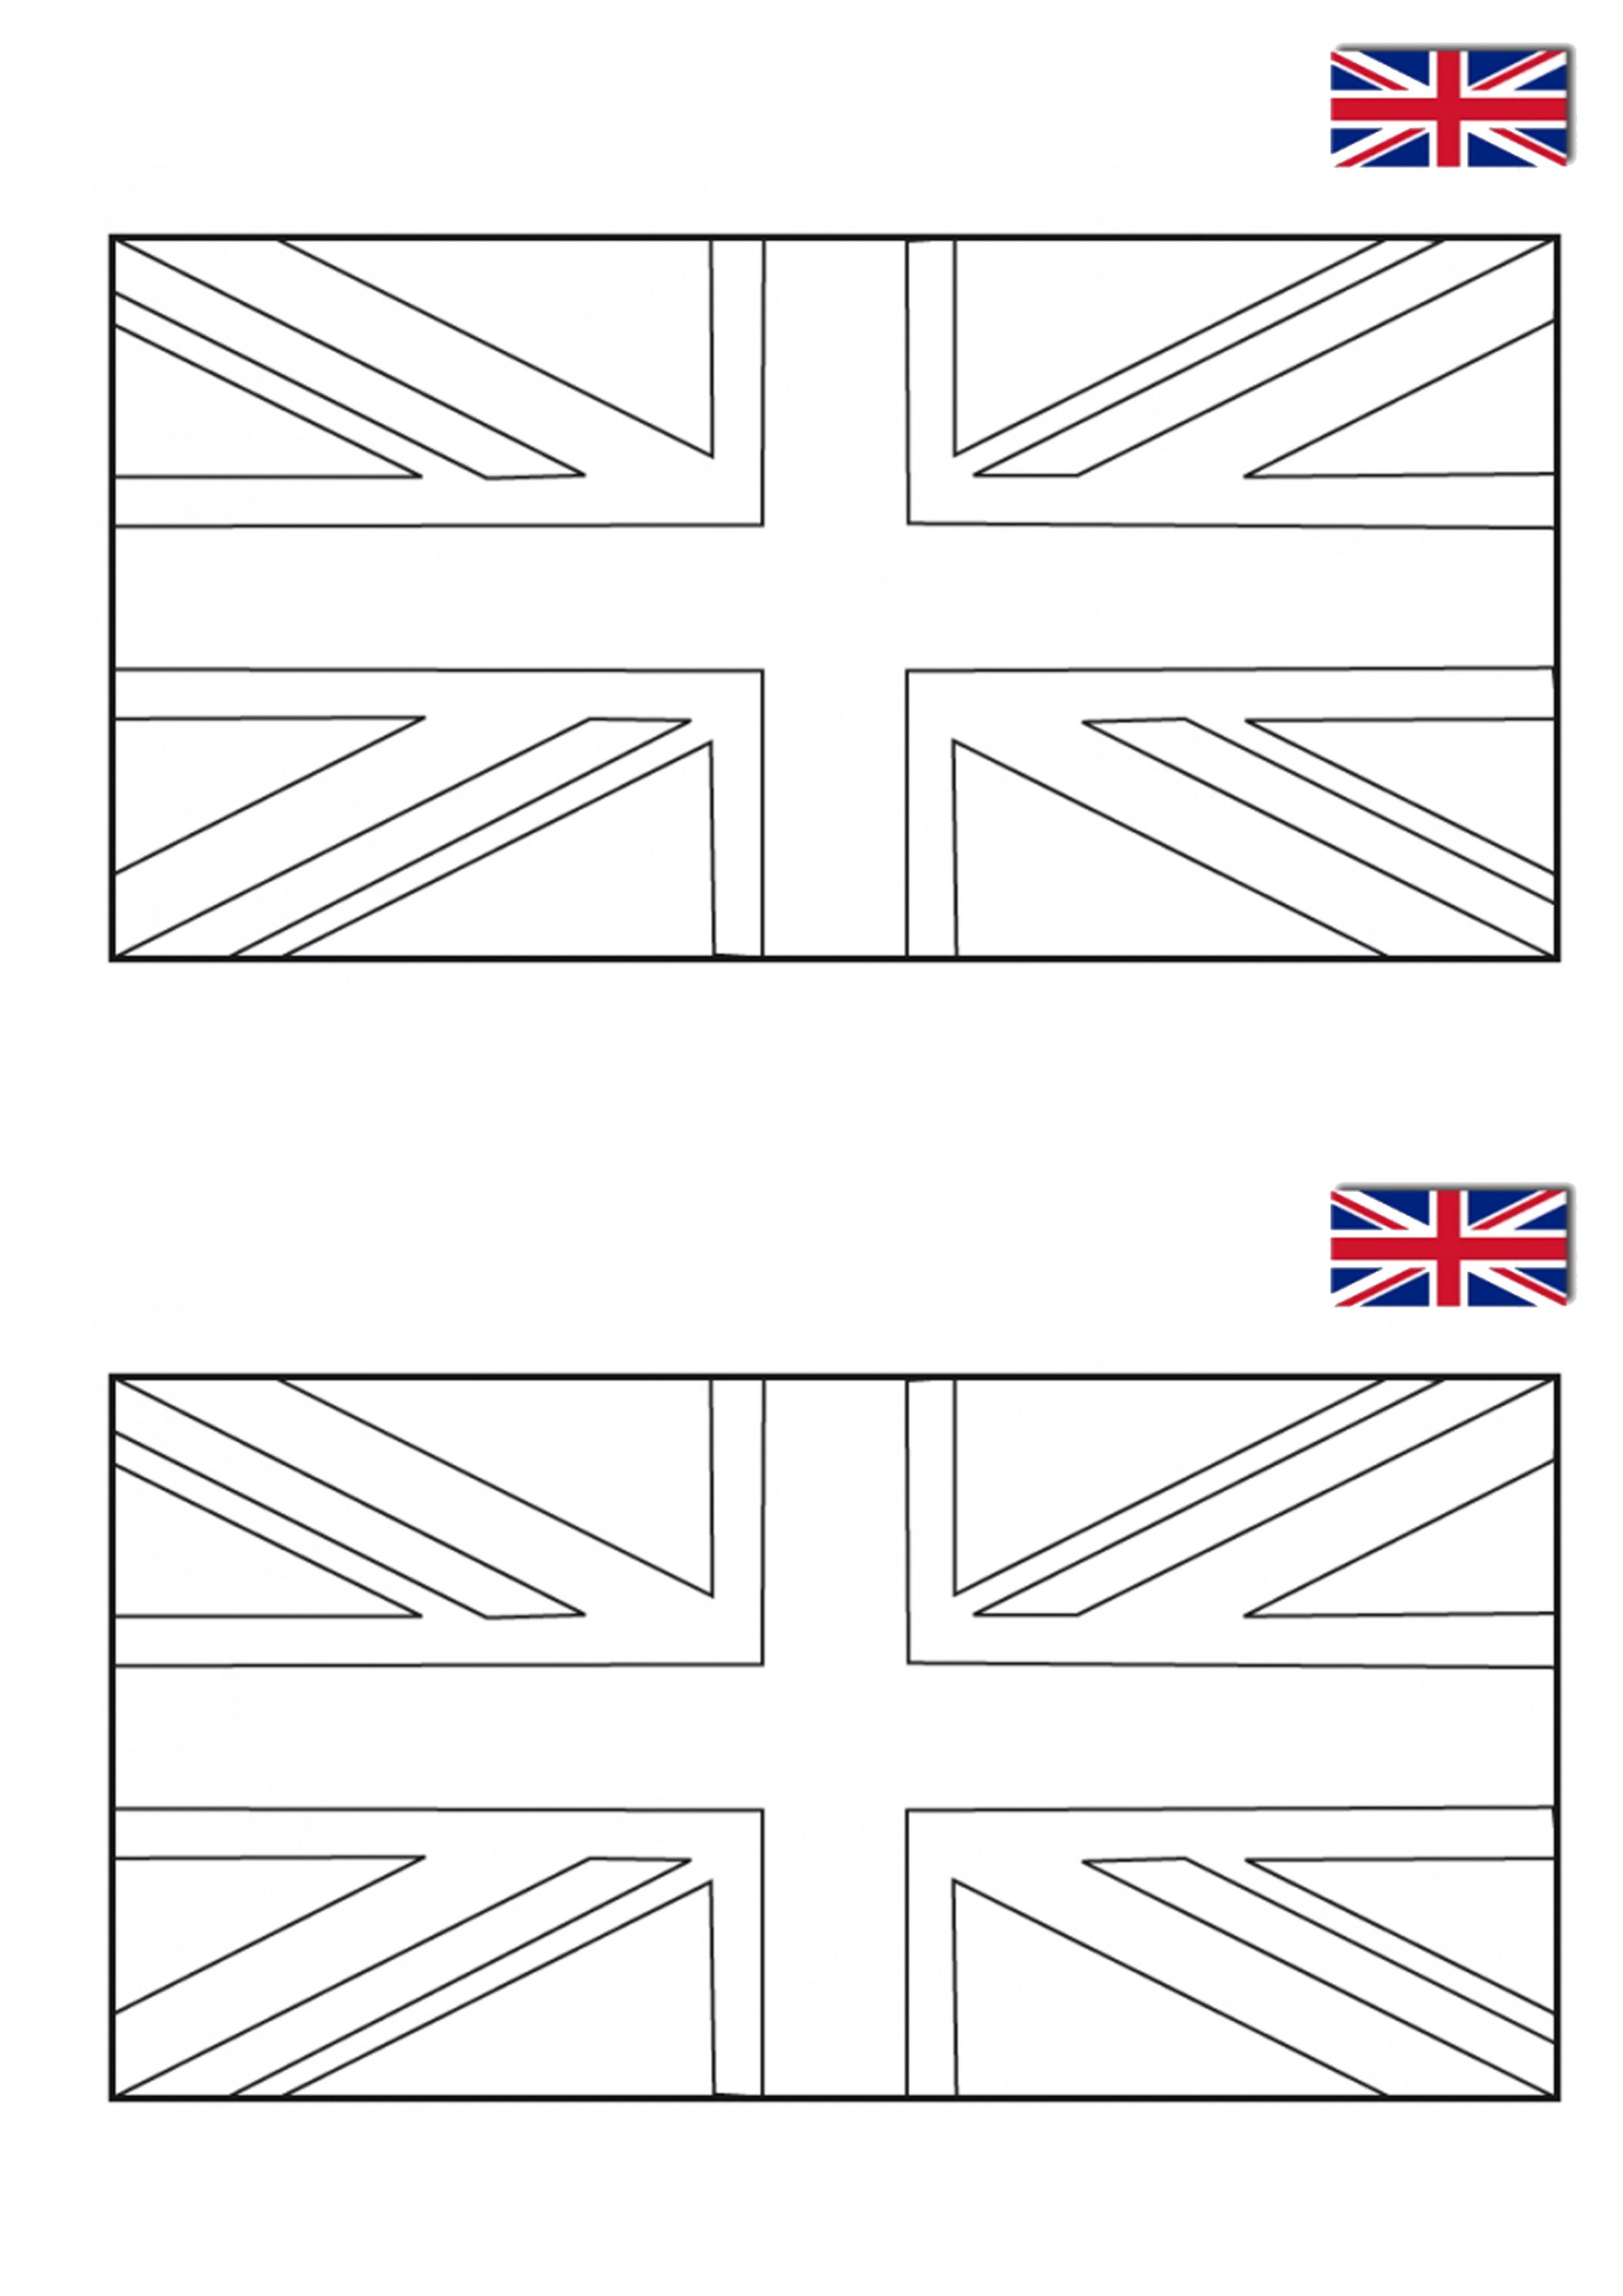 lapbook royaume-uni drapeau